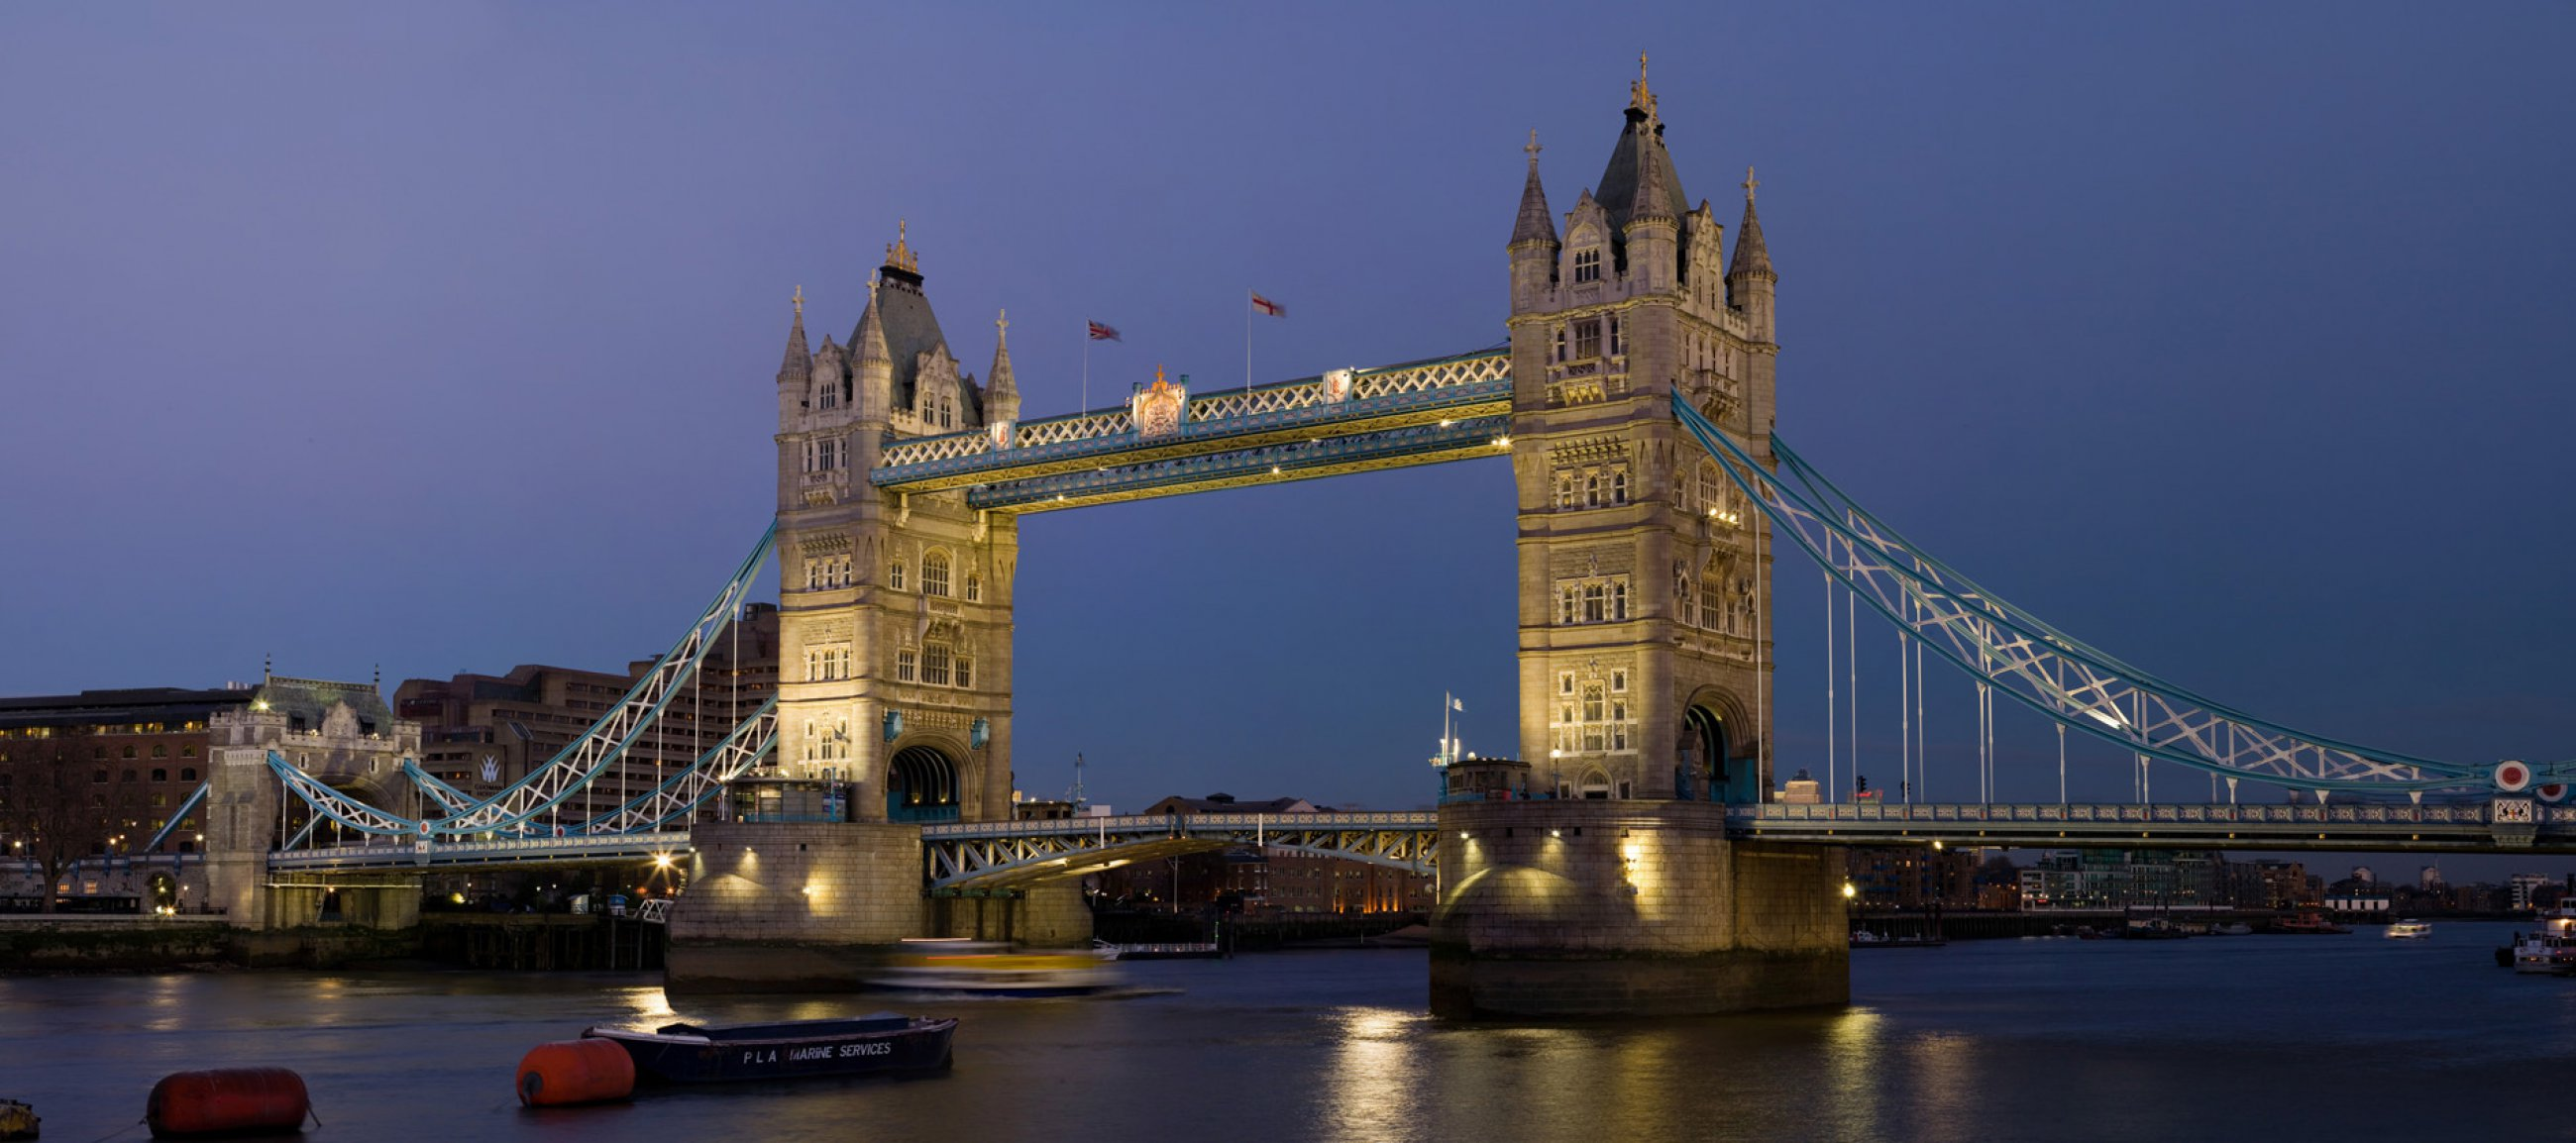 https://bubo.sk/uploads/galleries/5048/london-tower-bridge-london-dusk-feb-2006.jpg